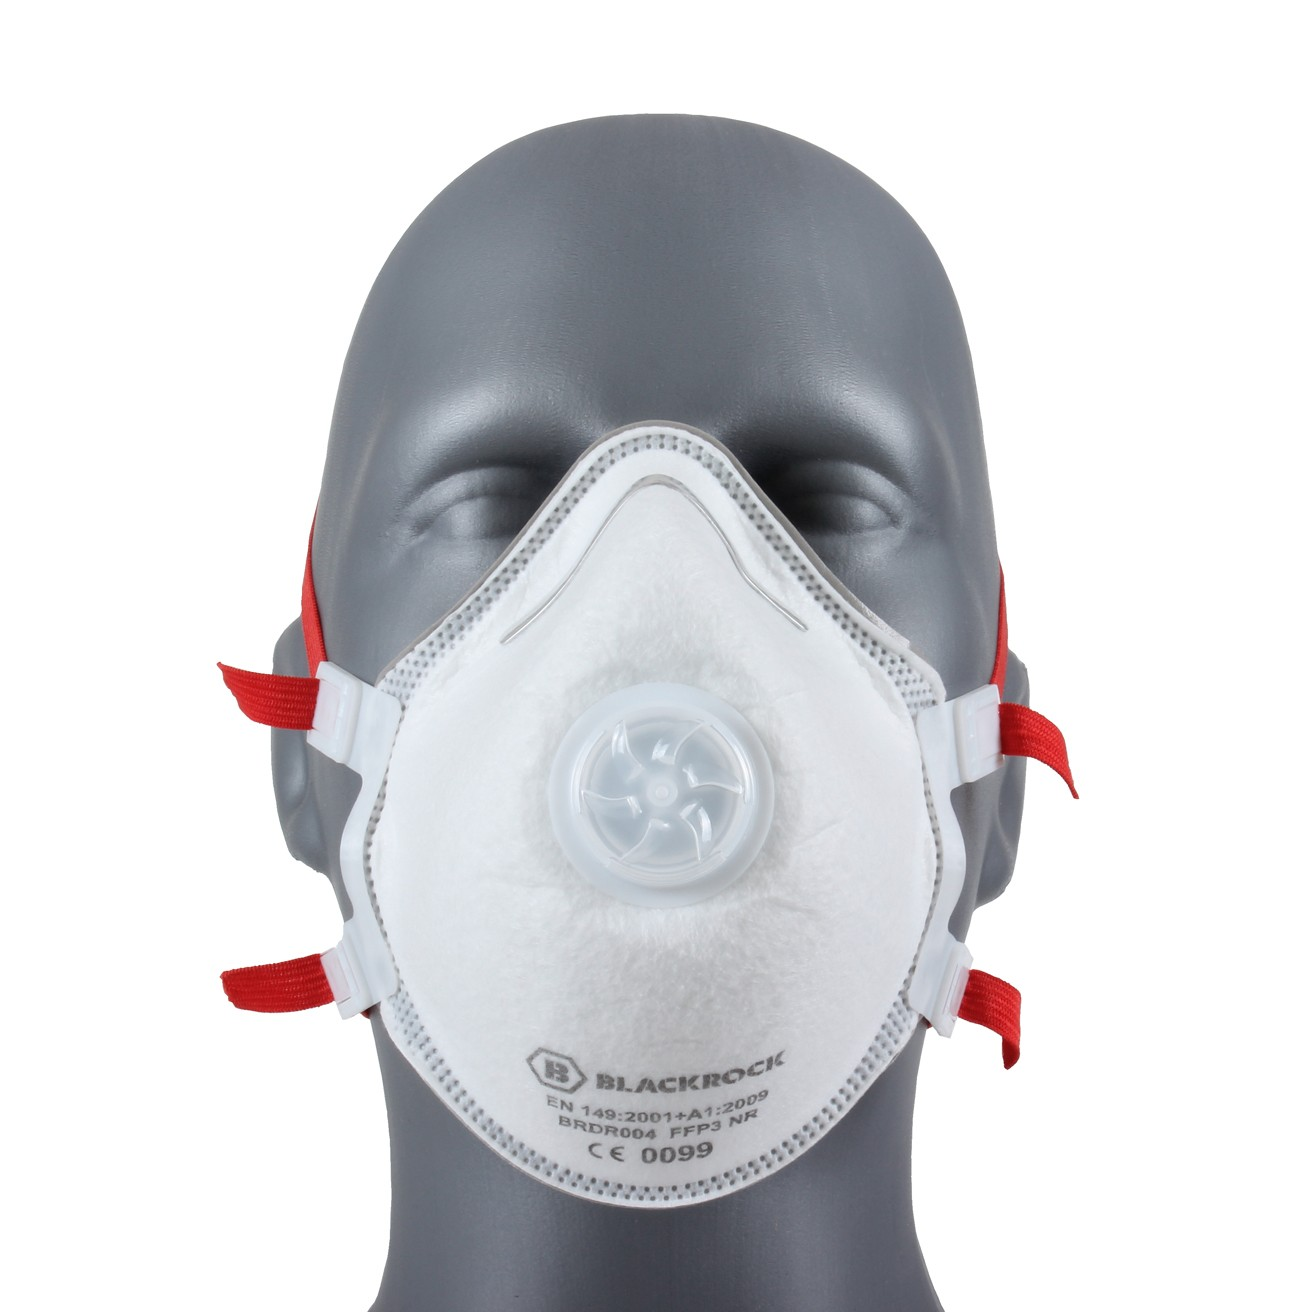 Eazi-Breathe FFP3 Moulded Disposable Respirator